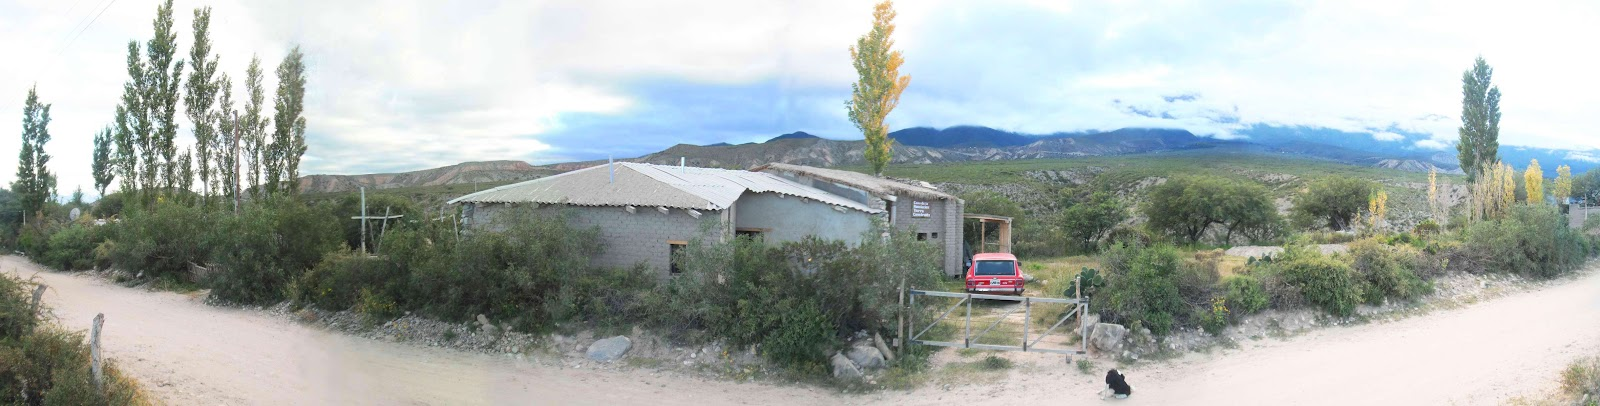 Amaicha del Valle : Projet 2.011 panoramique-2011-copie